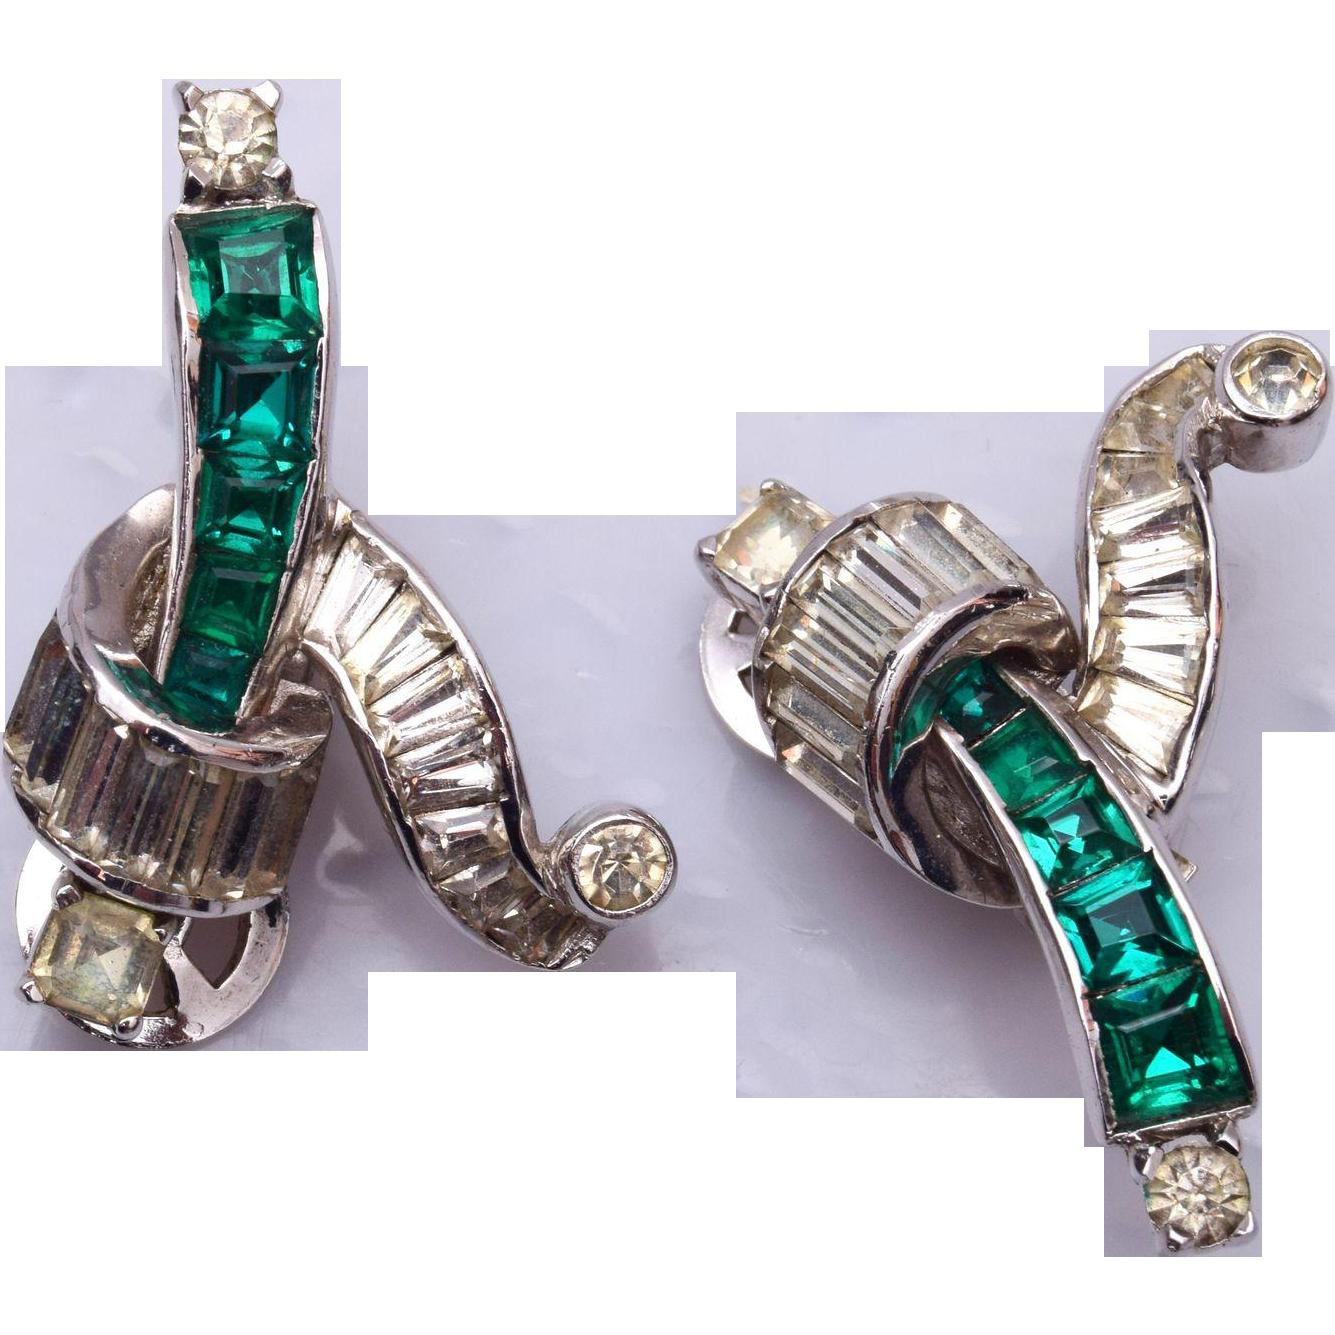 Mazer Beautiful Green Rhinestone Earrings